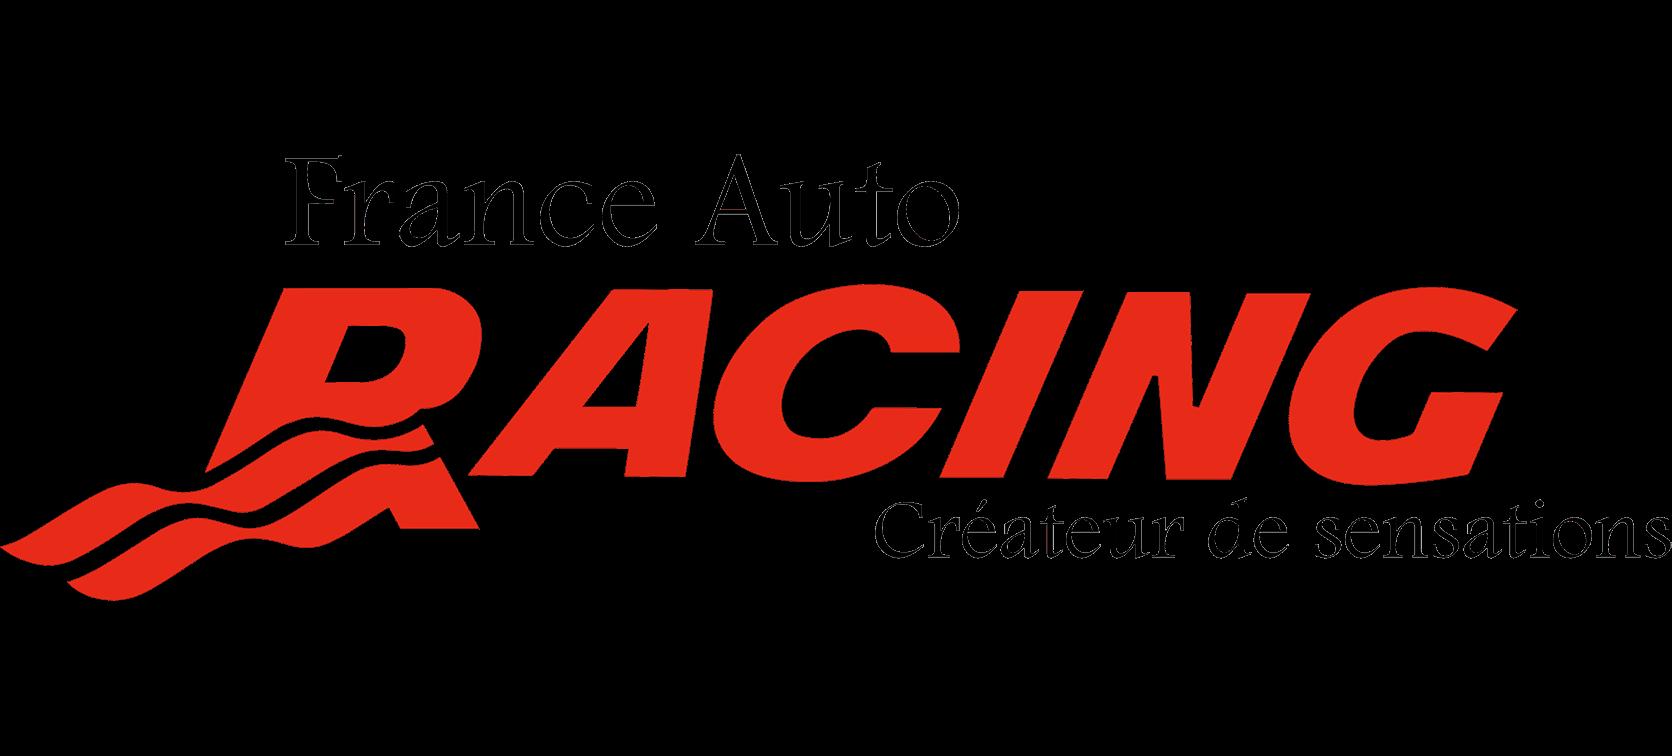 france-auto-racing-1-1672x756